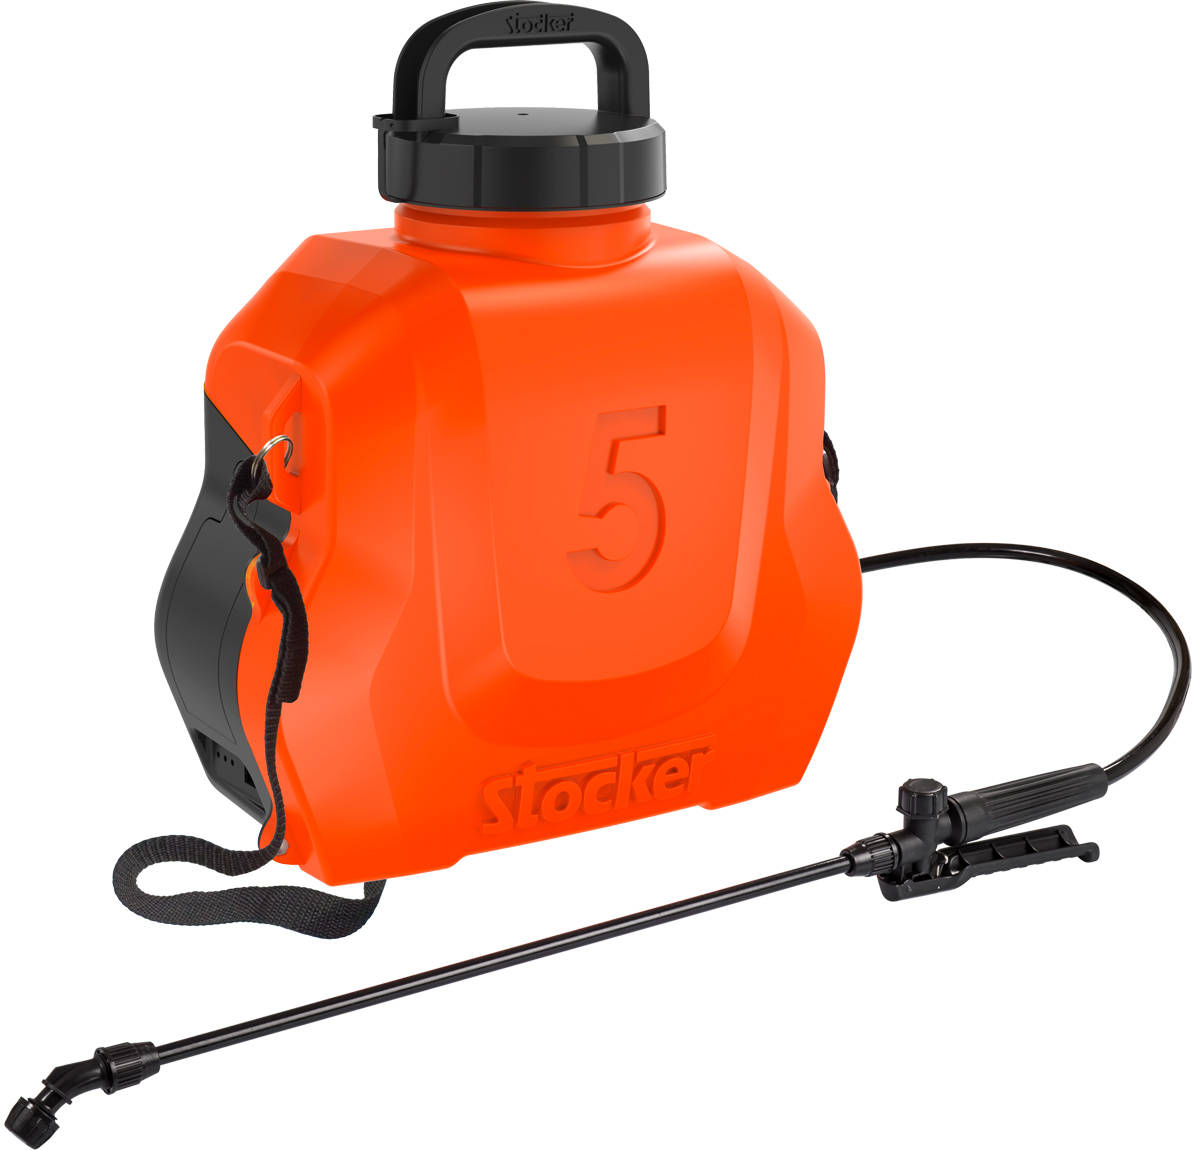 230-pompa-irroratrice-elettrica-a-zaino-li-ion-stocker-5-l